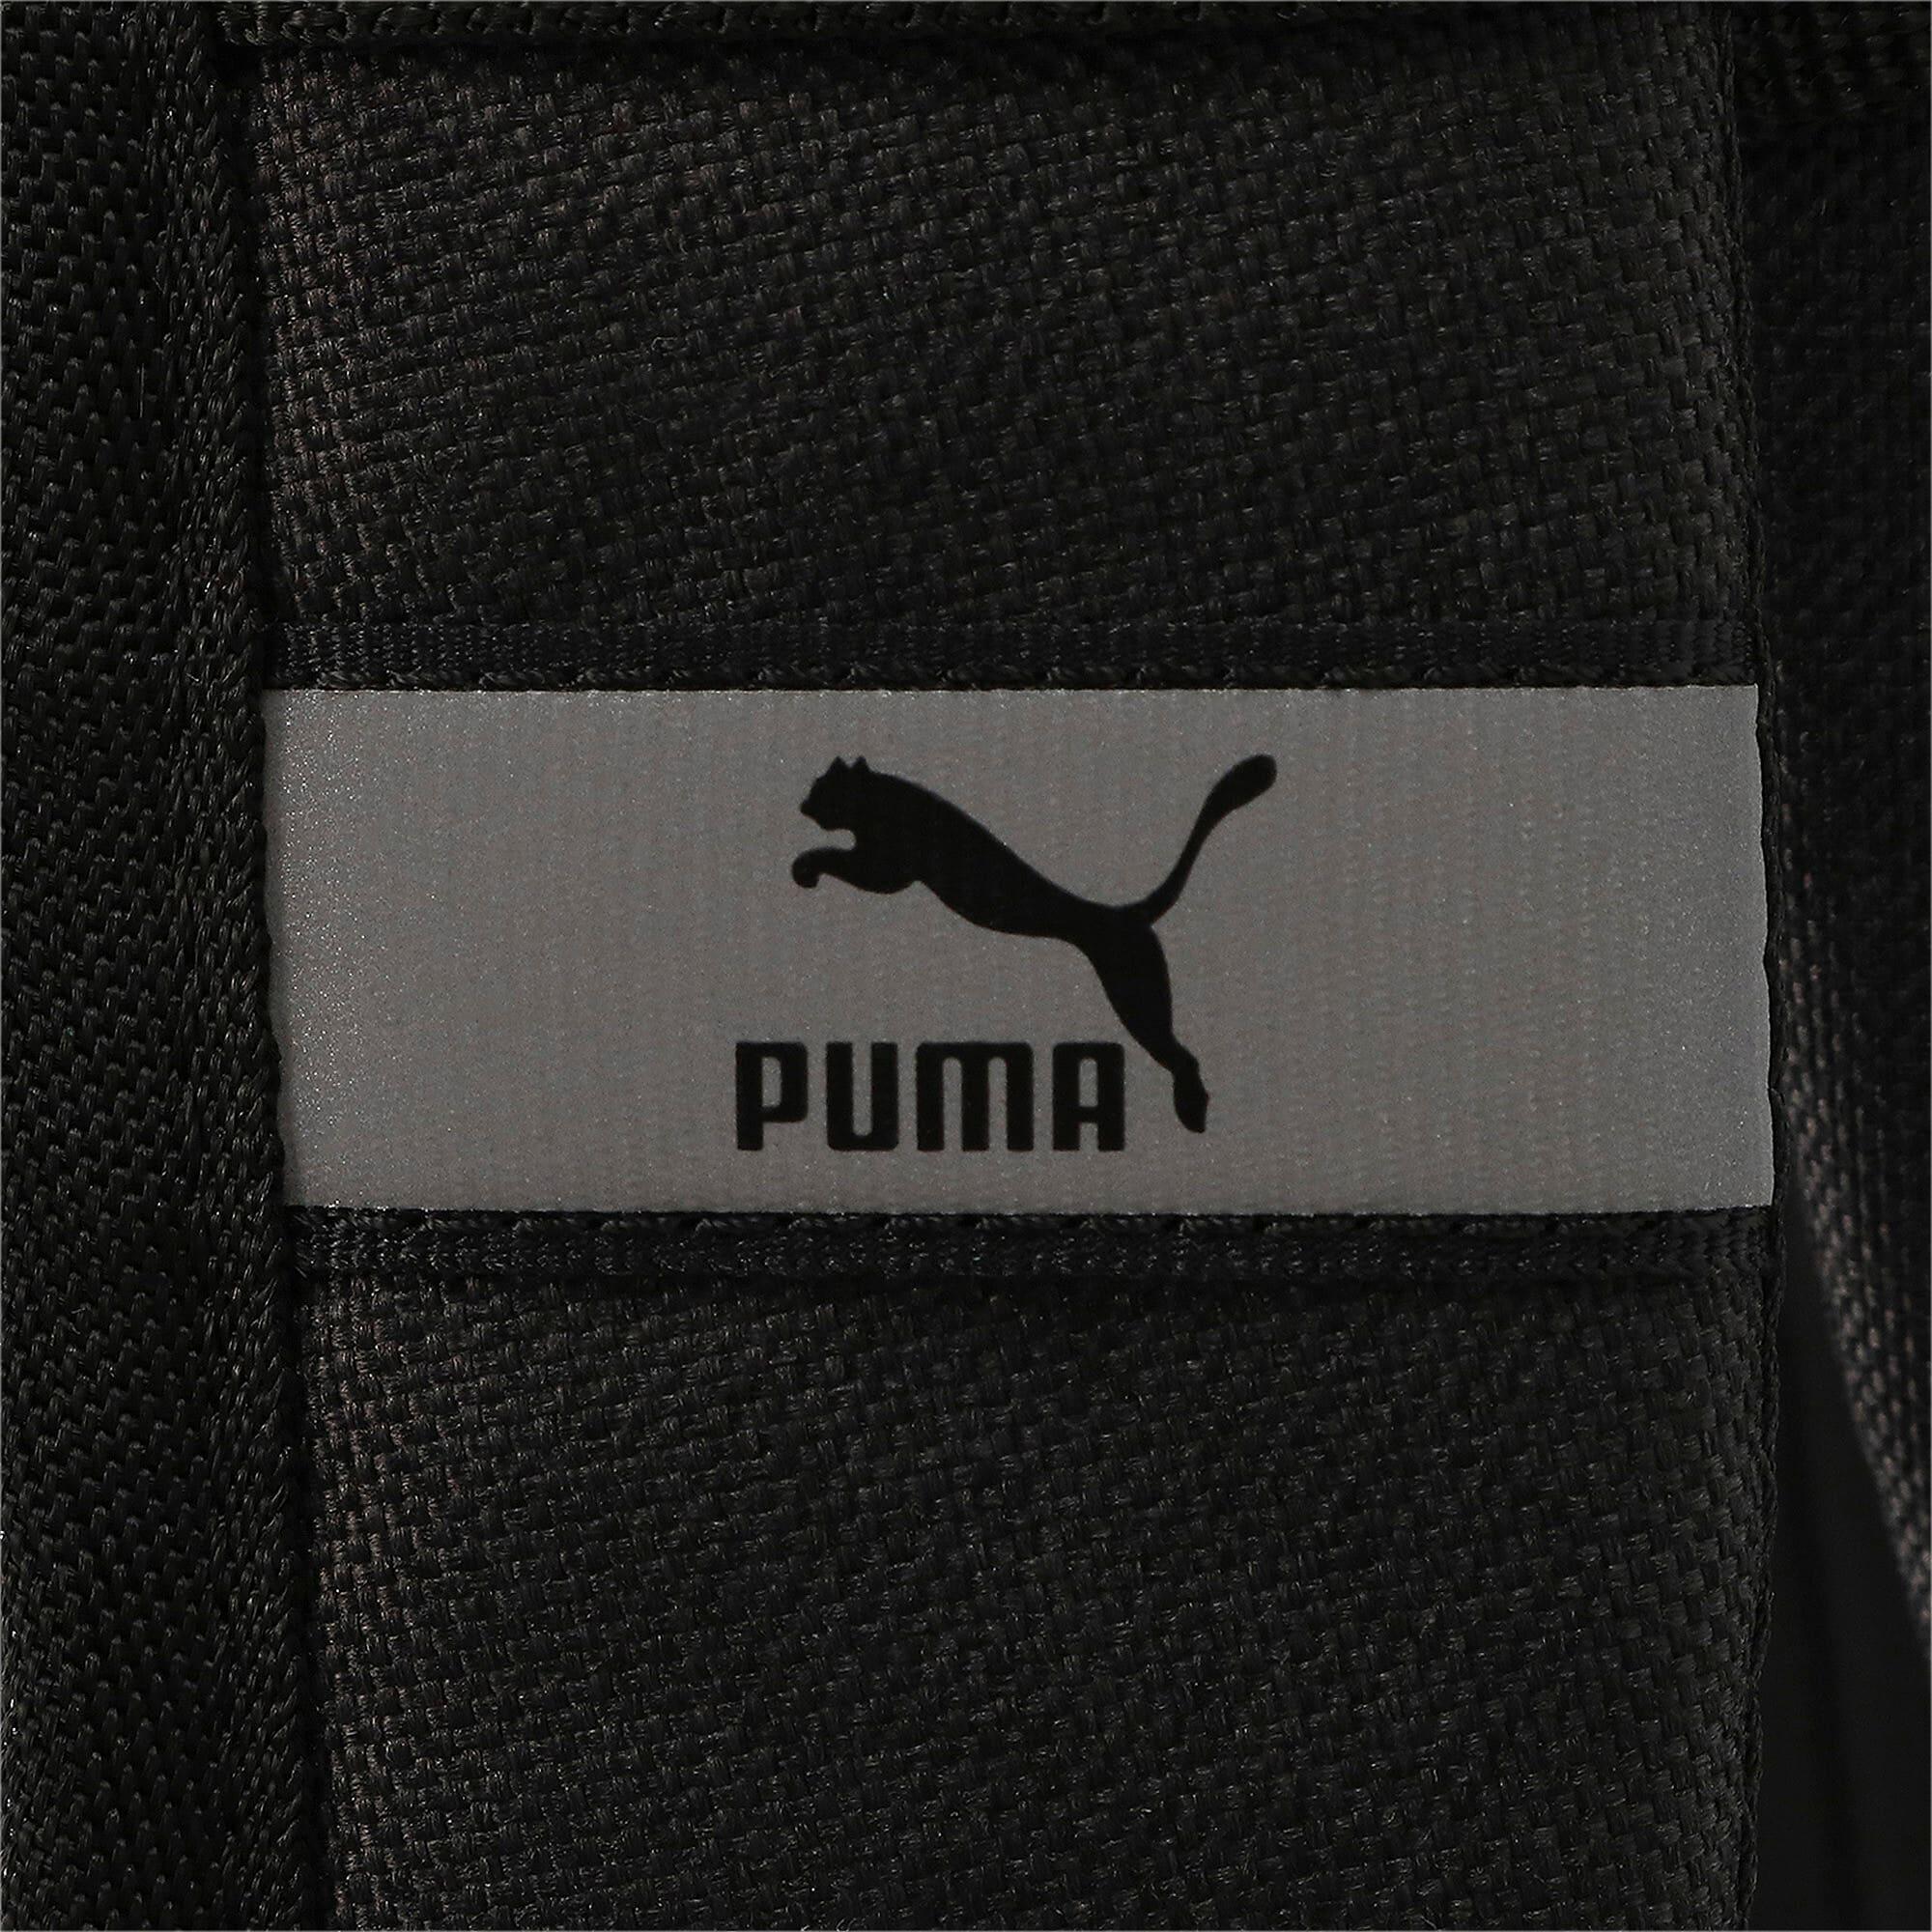 Thumbnail 9 of オリジナルス バックパック レトロ ウーブン 23L, Puma Black, medium-JPN